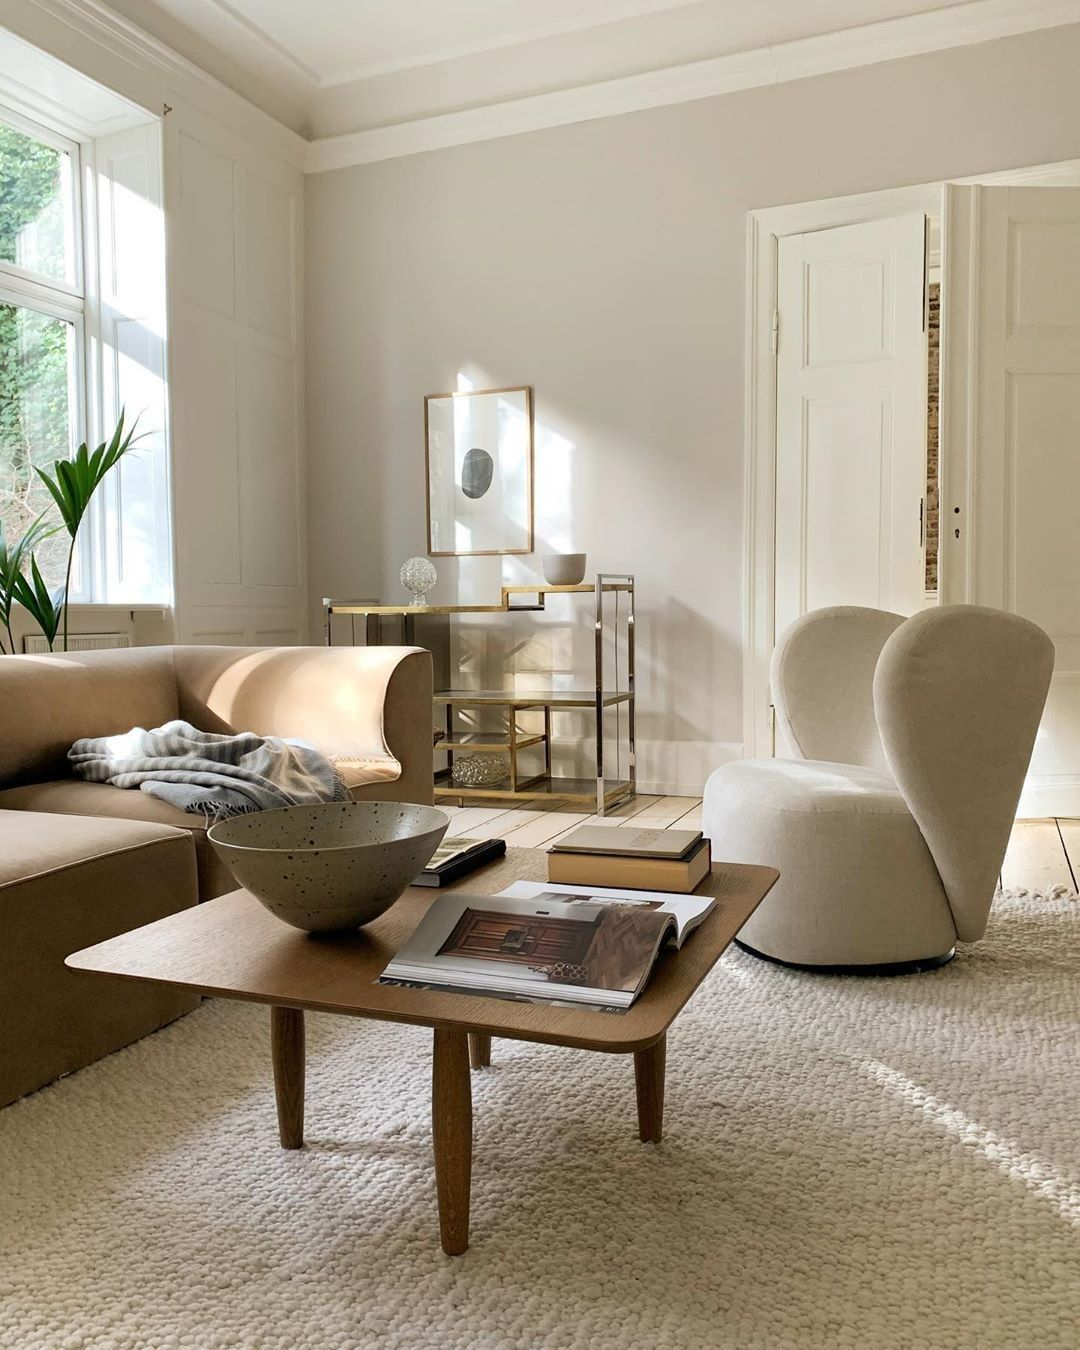 Studio Paradissi Pebble 05 Art Print The Poster Club In 2020 Decor Home Living Room Interior Home Living Room #small #living #room #ottoman